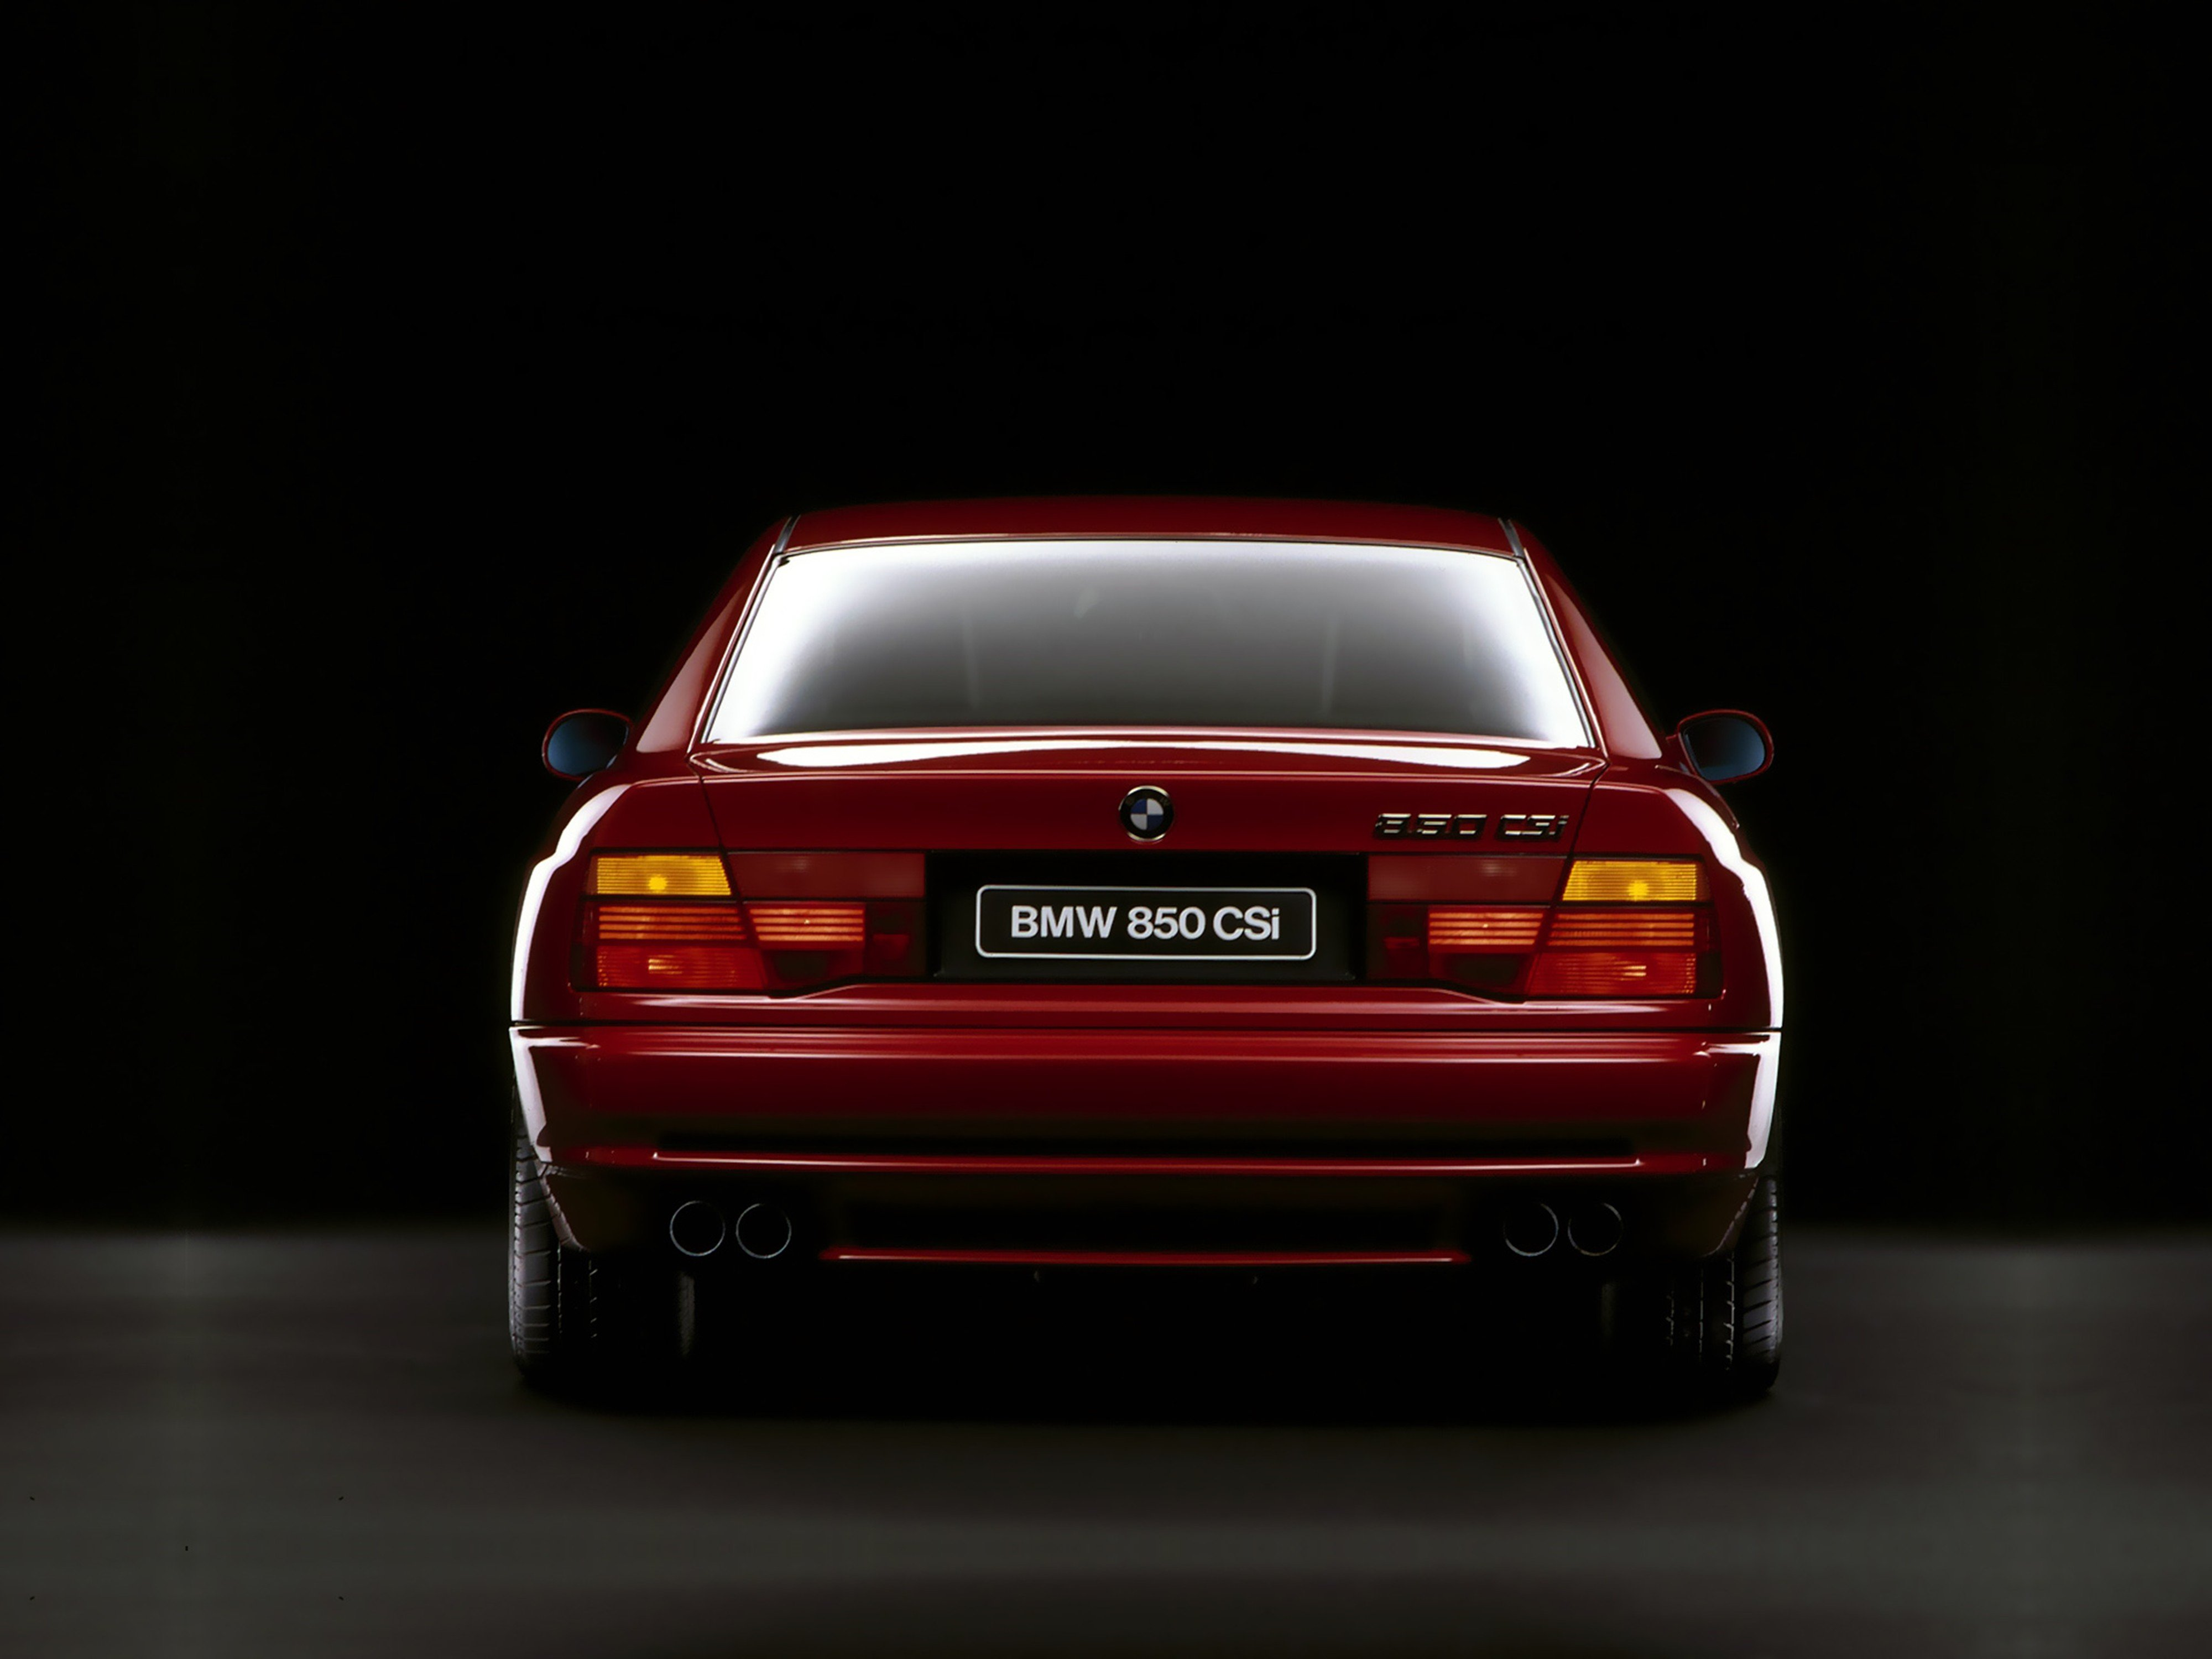 1992 Bmw 850 Csi Car Vehicle Classic Sport Supercar